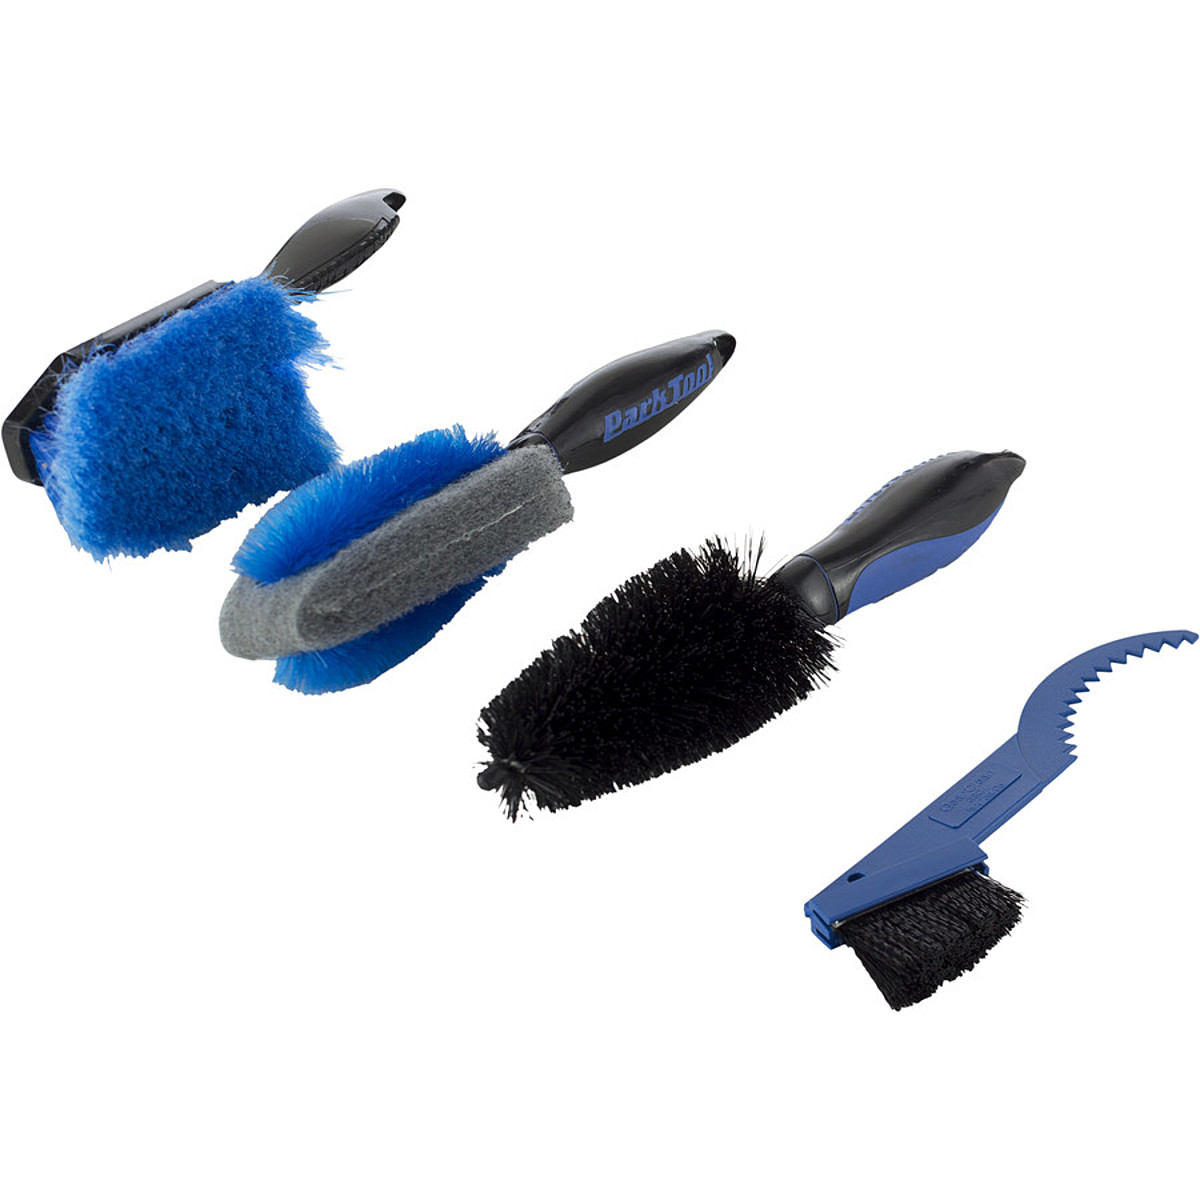 Park Tool BCB-4.2 Bike Cleaning Brush Set Blue, One Size